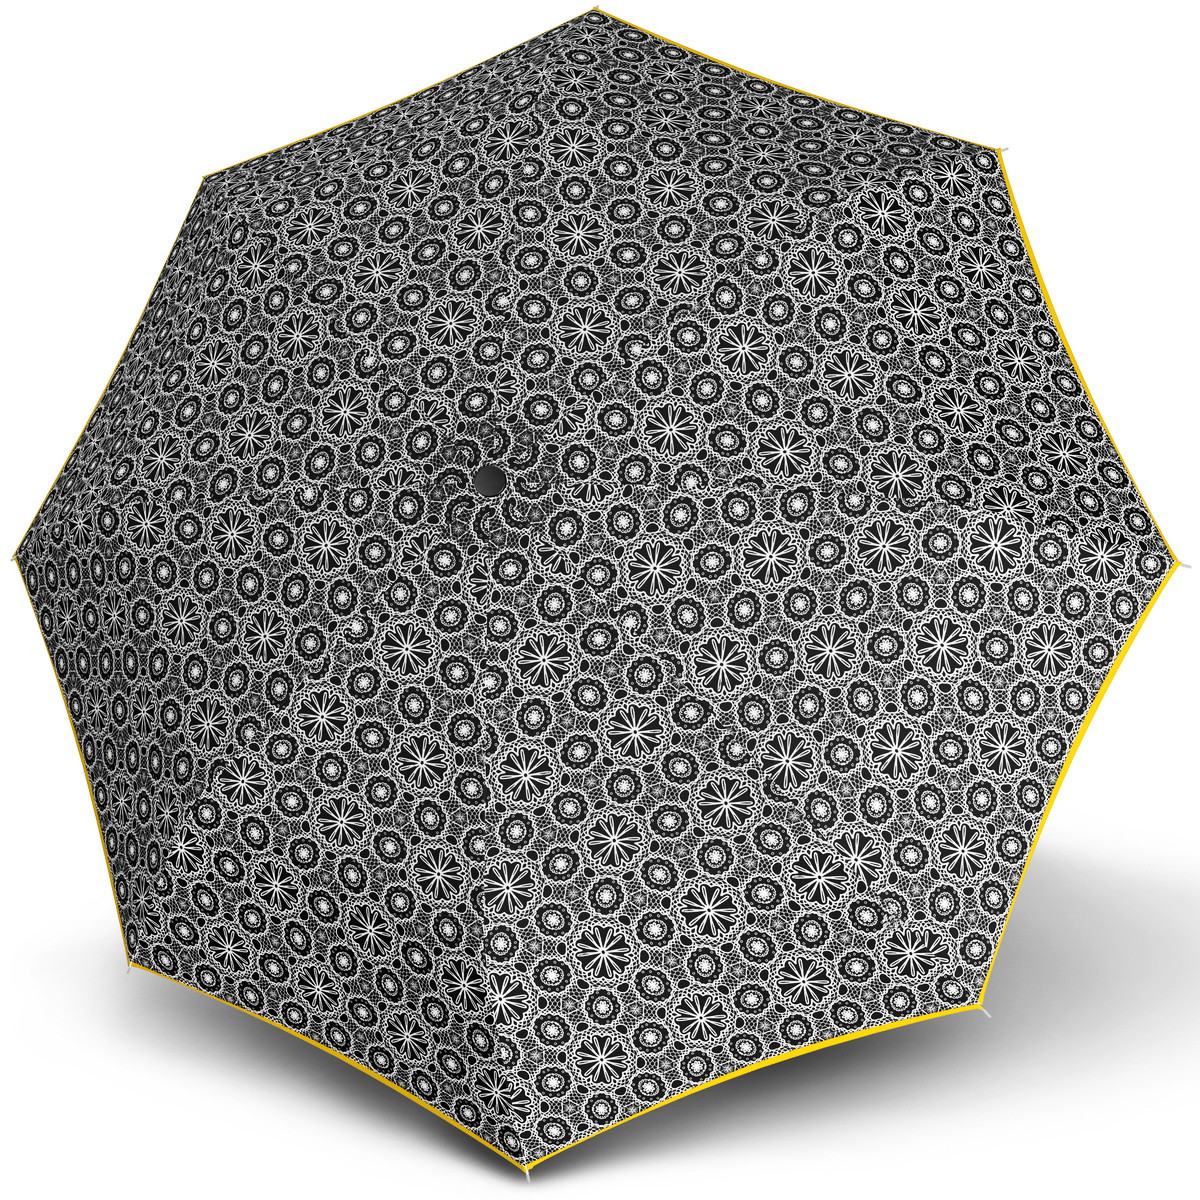 Зонт Doppler 744165PL-8 колекція DERBY, Антиветер